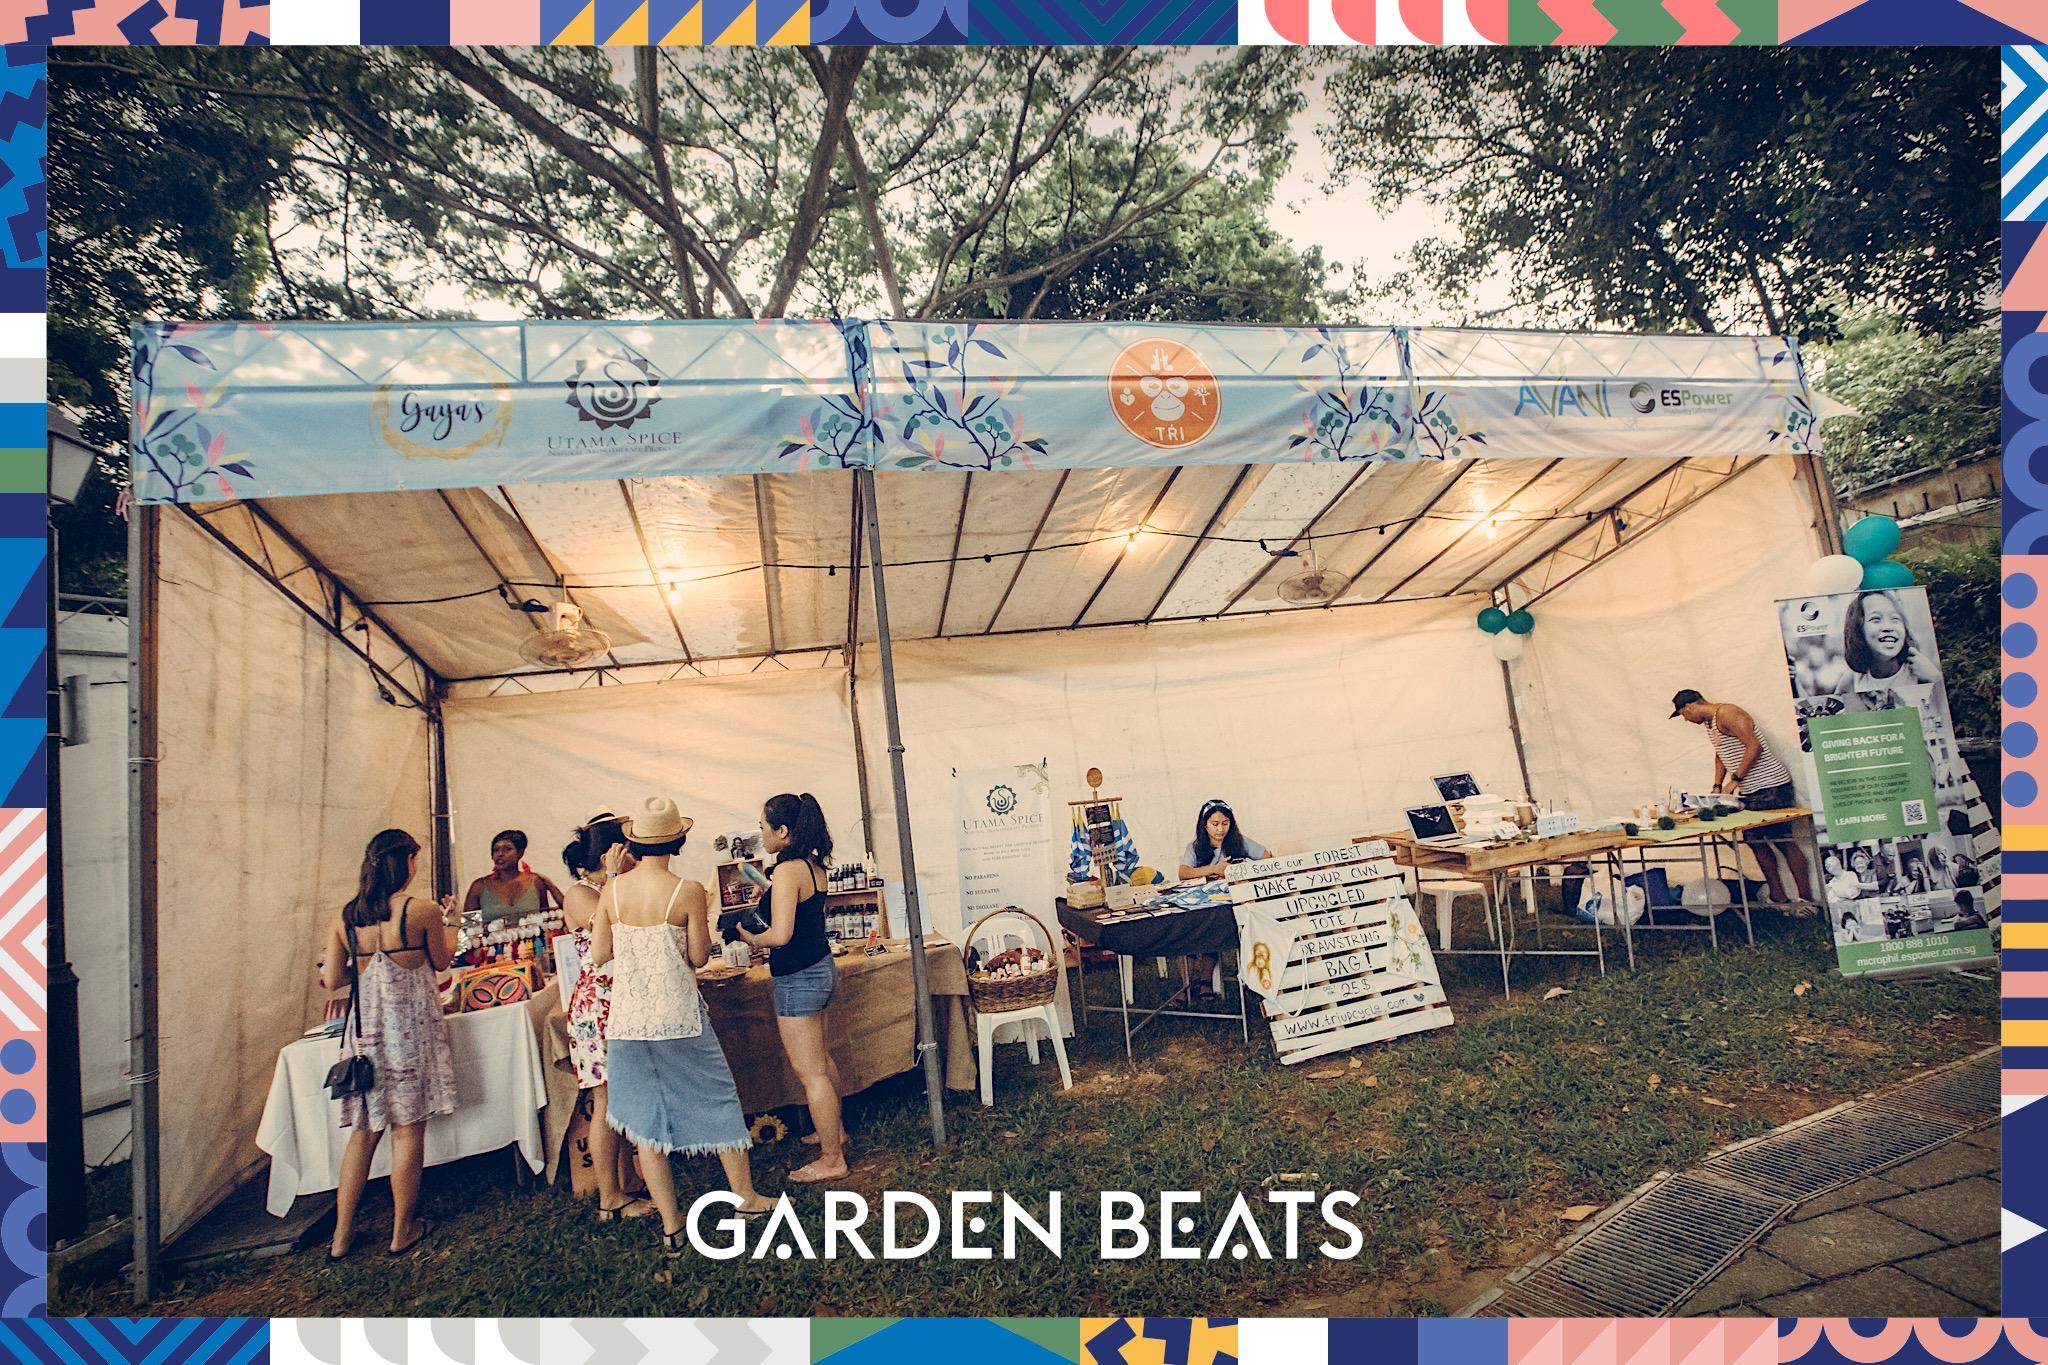 03032018_GardenBeats_Colossal425_Watermarked.jpg